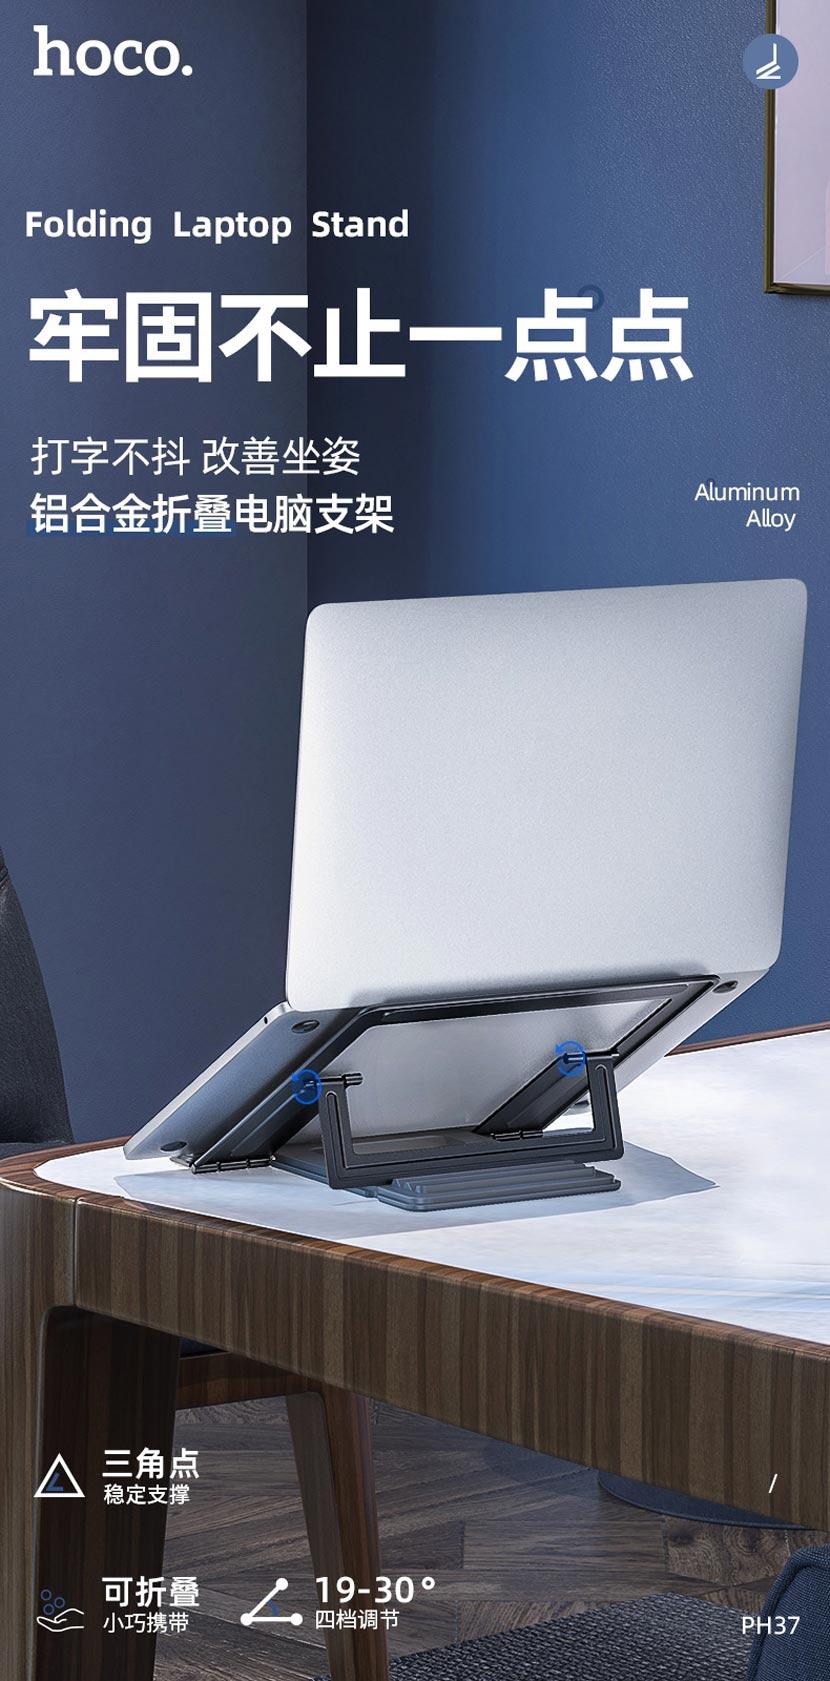 hoco news ph37 excellent aluminum alloy folding laptop stand cn